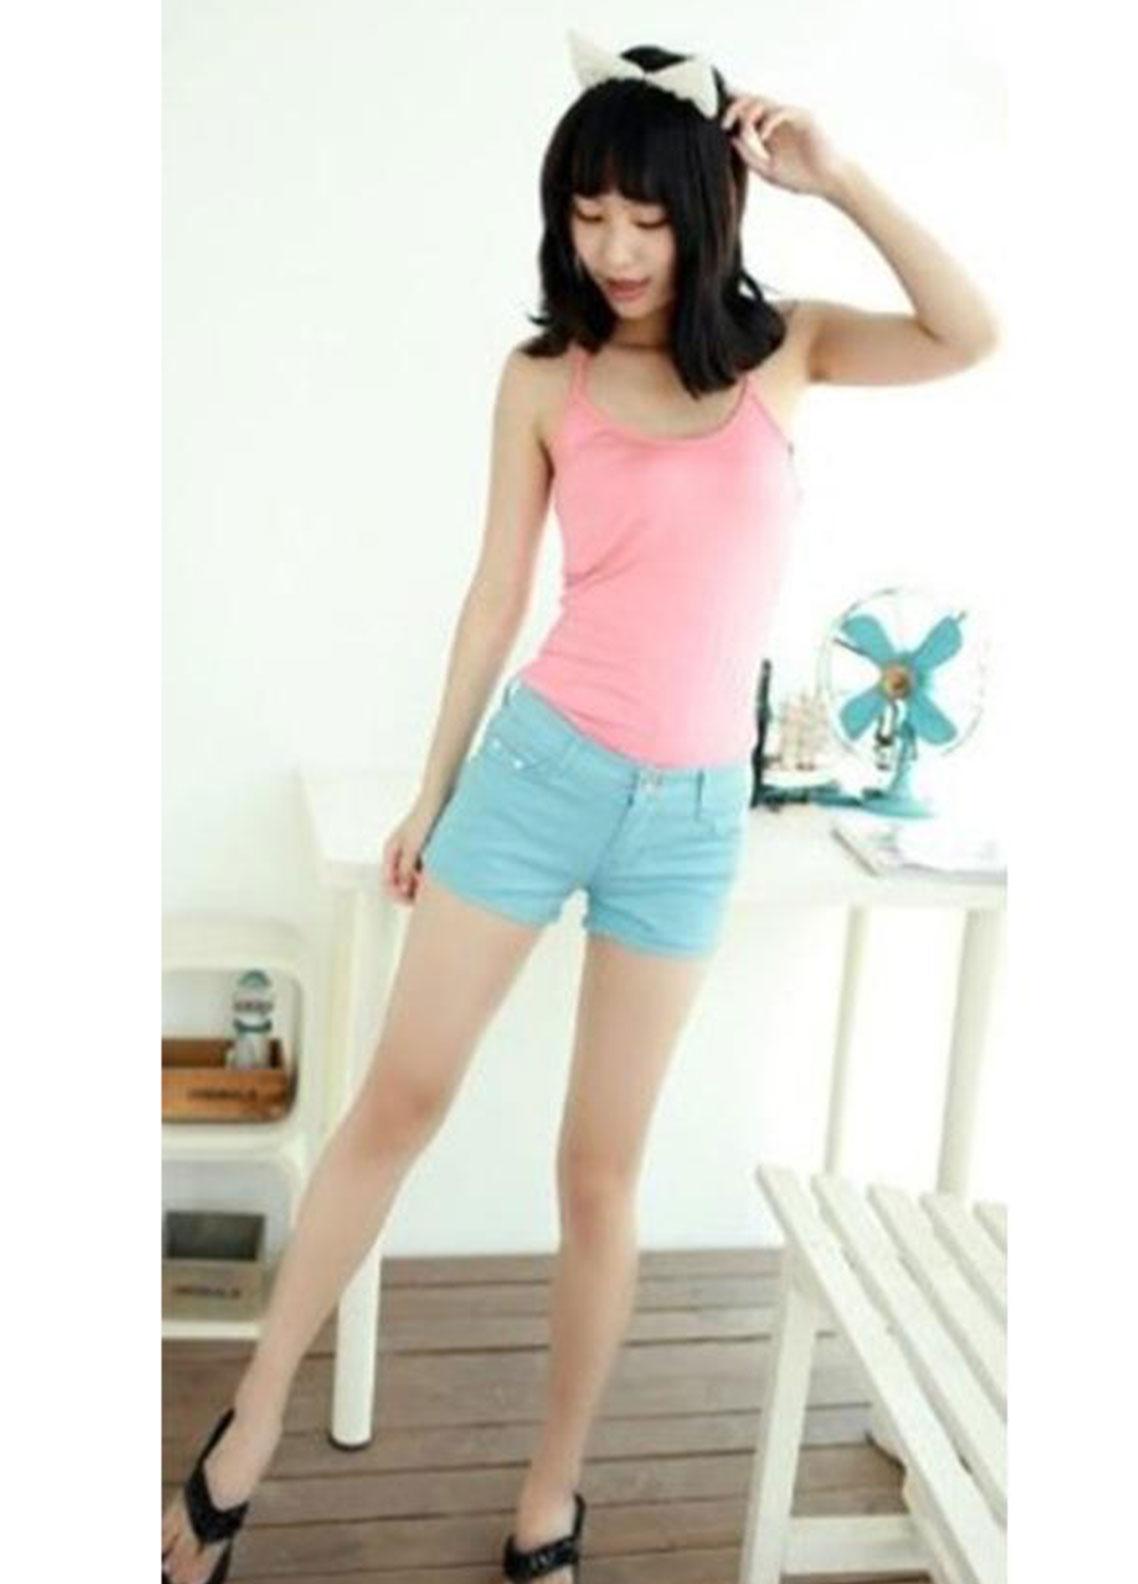 Ignite Wardrobe Stretchable Cotton Shorts IG20HPW 003